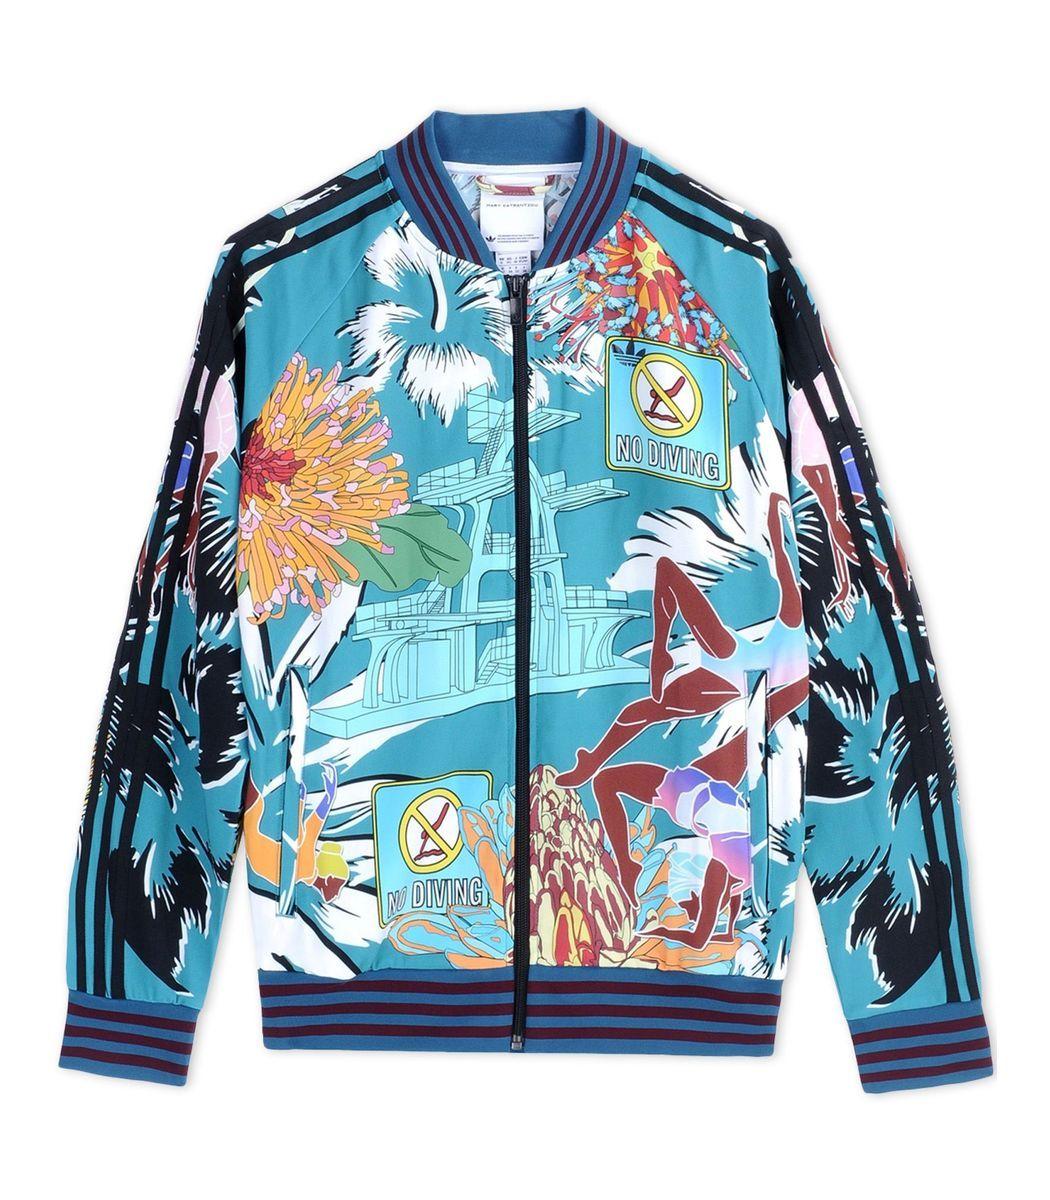 4a2efc2b1391 Adidas X Mary Katrantzou Printed Track Jacket